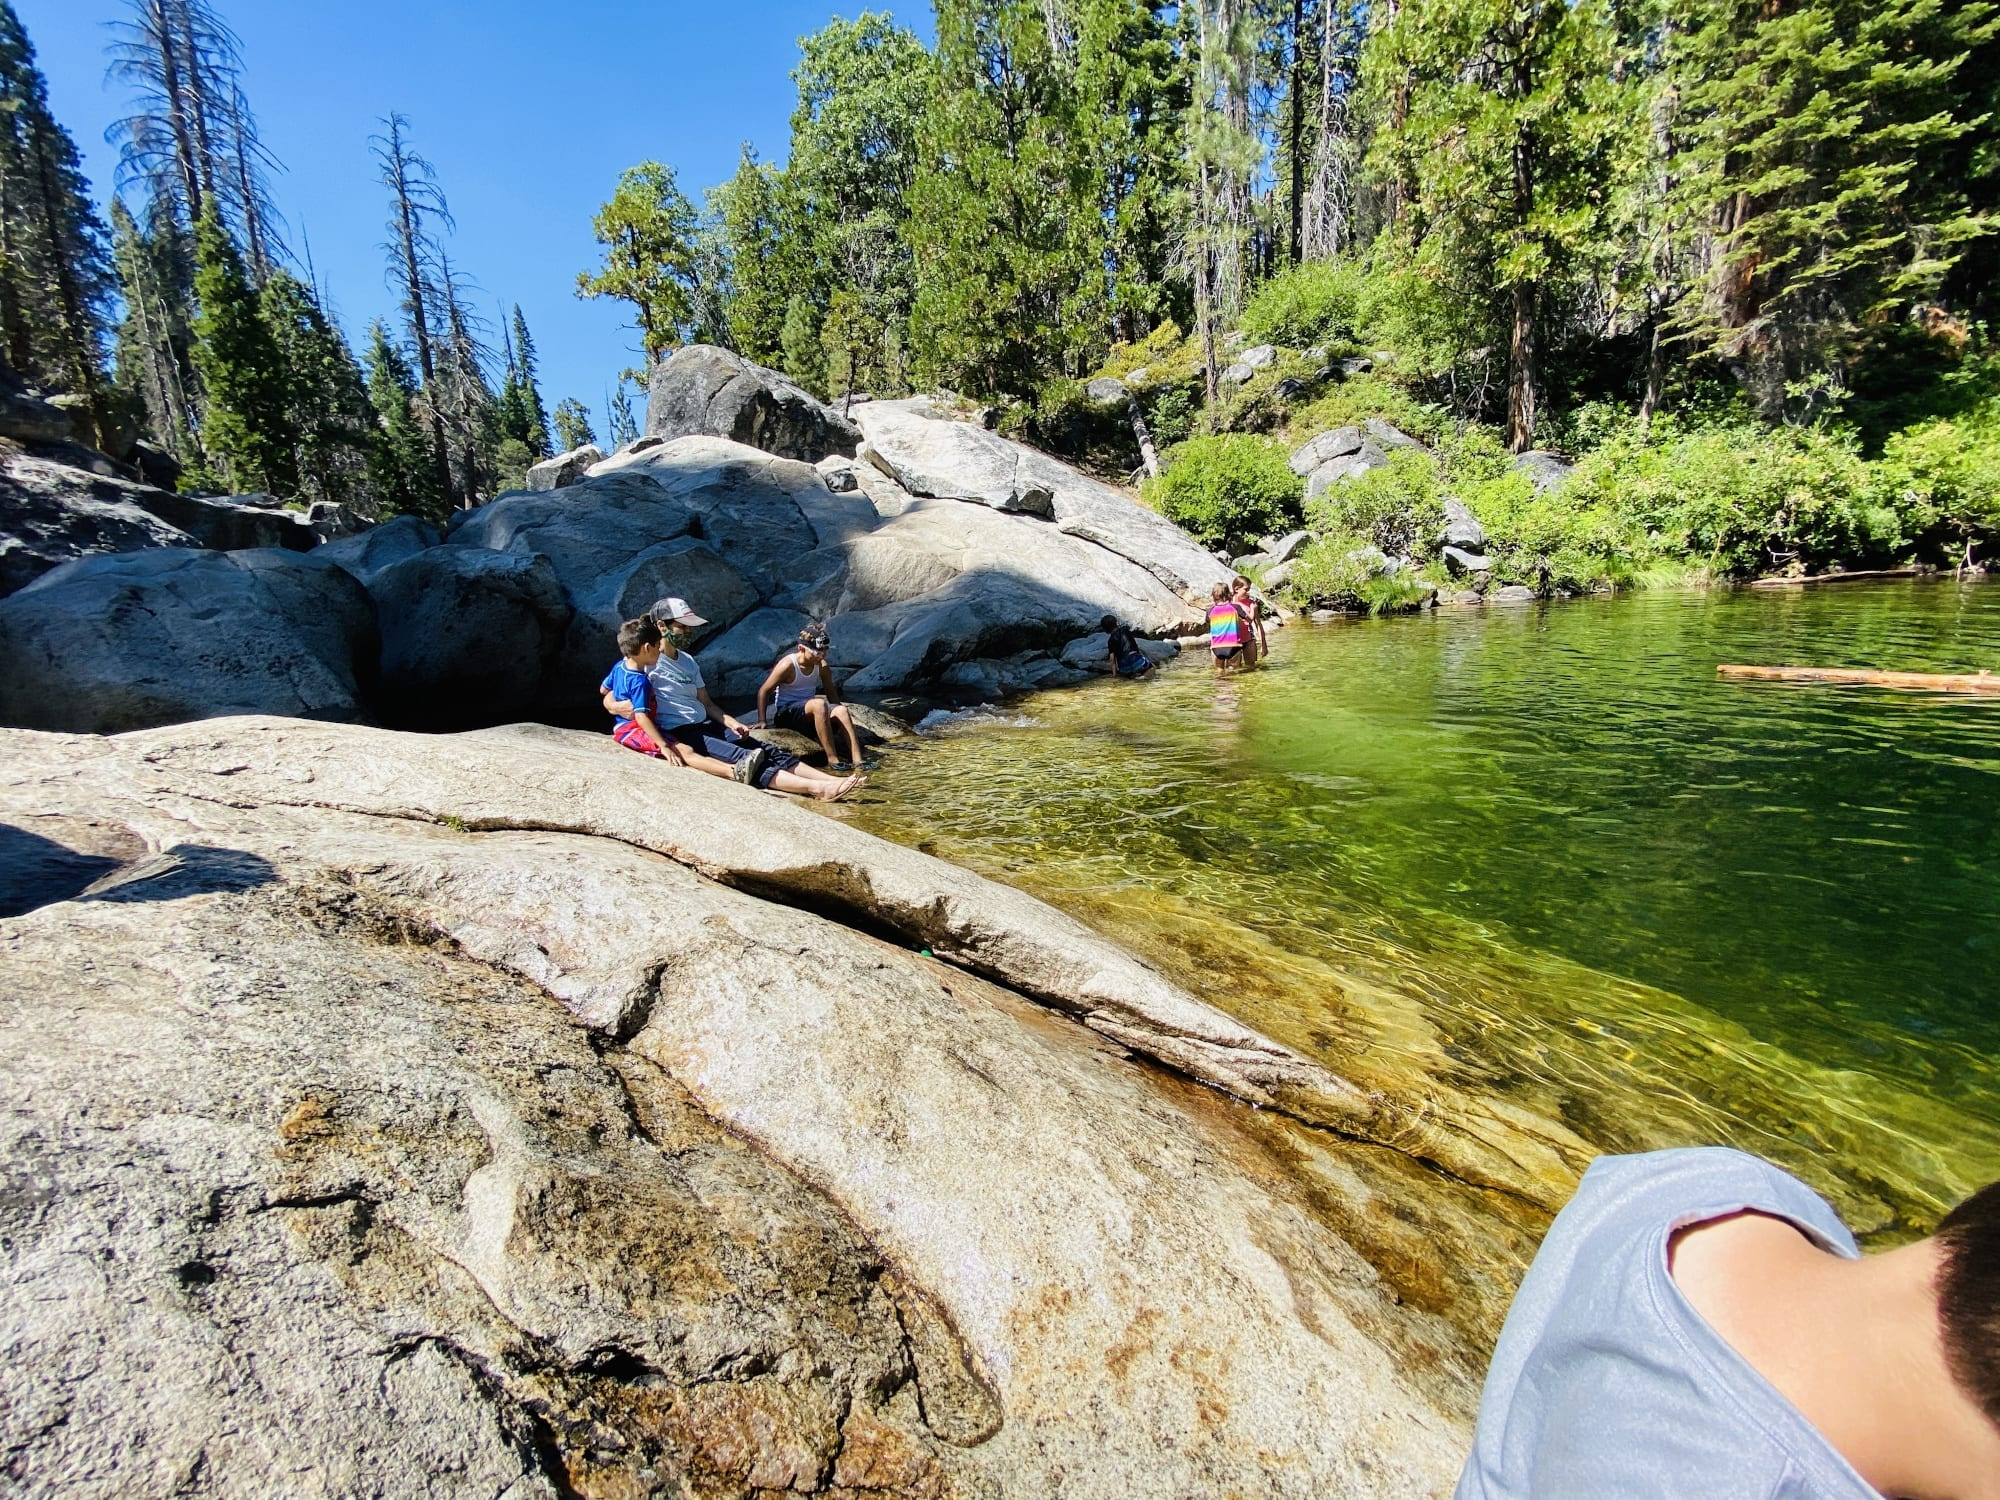 The Honeymoon Pool at Dinkey Creek Campground